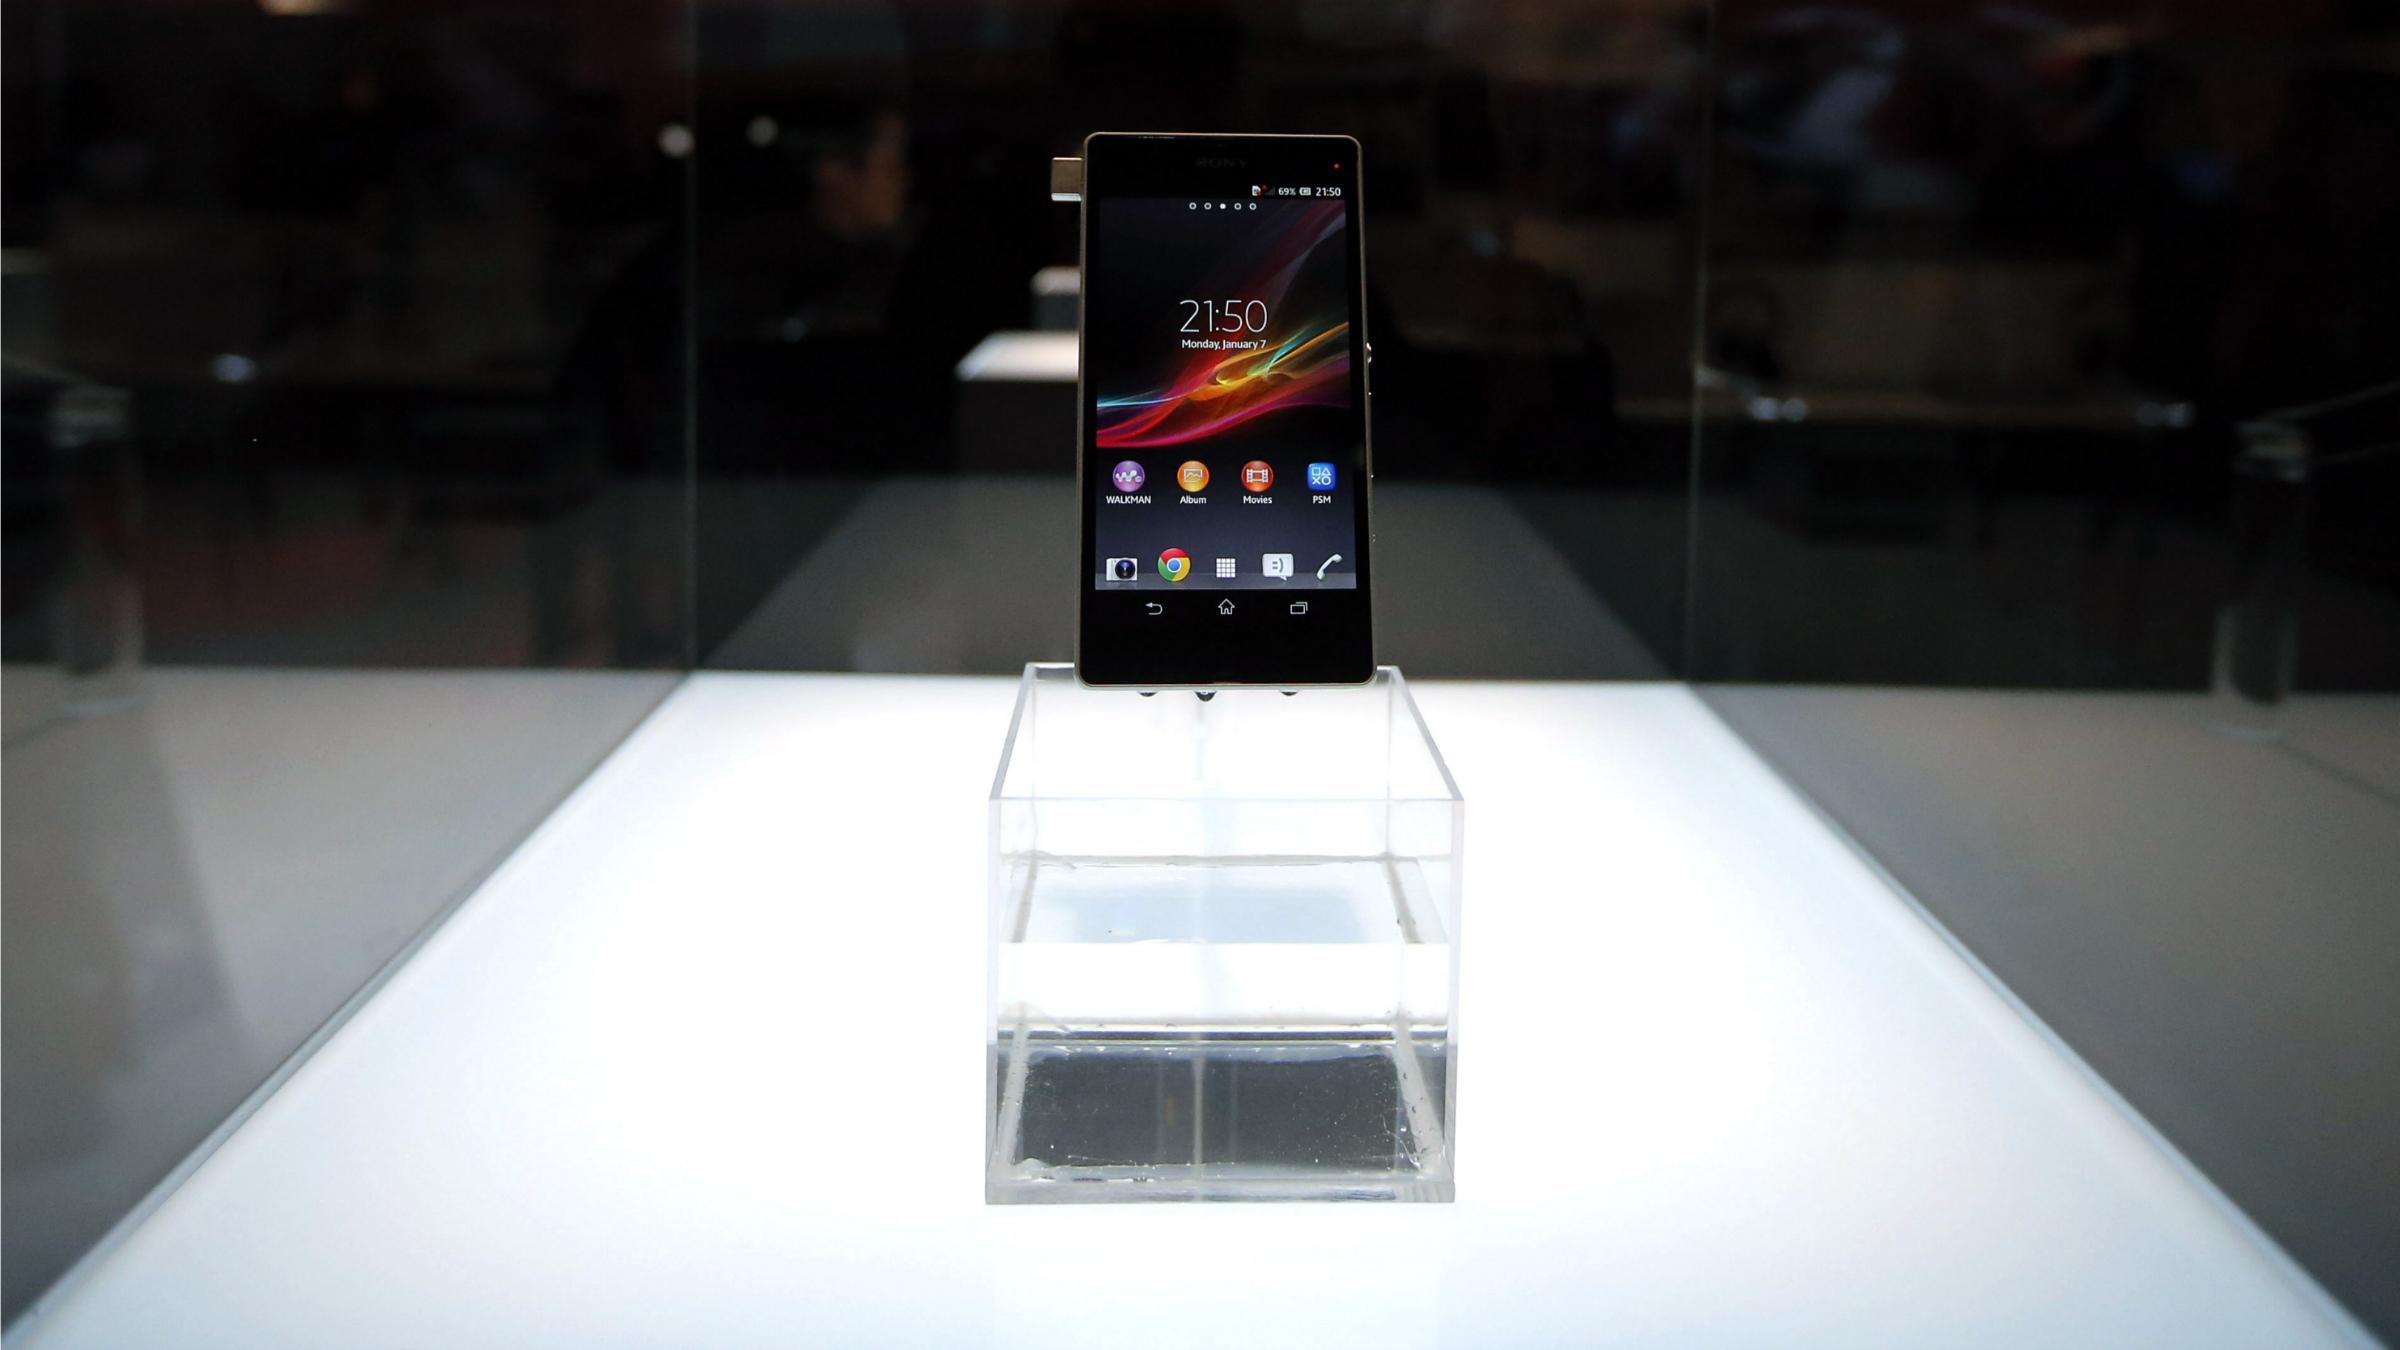 Sony's Xperia smartphone